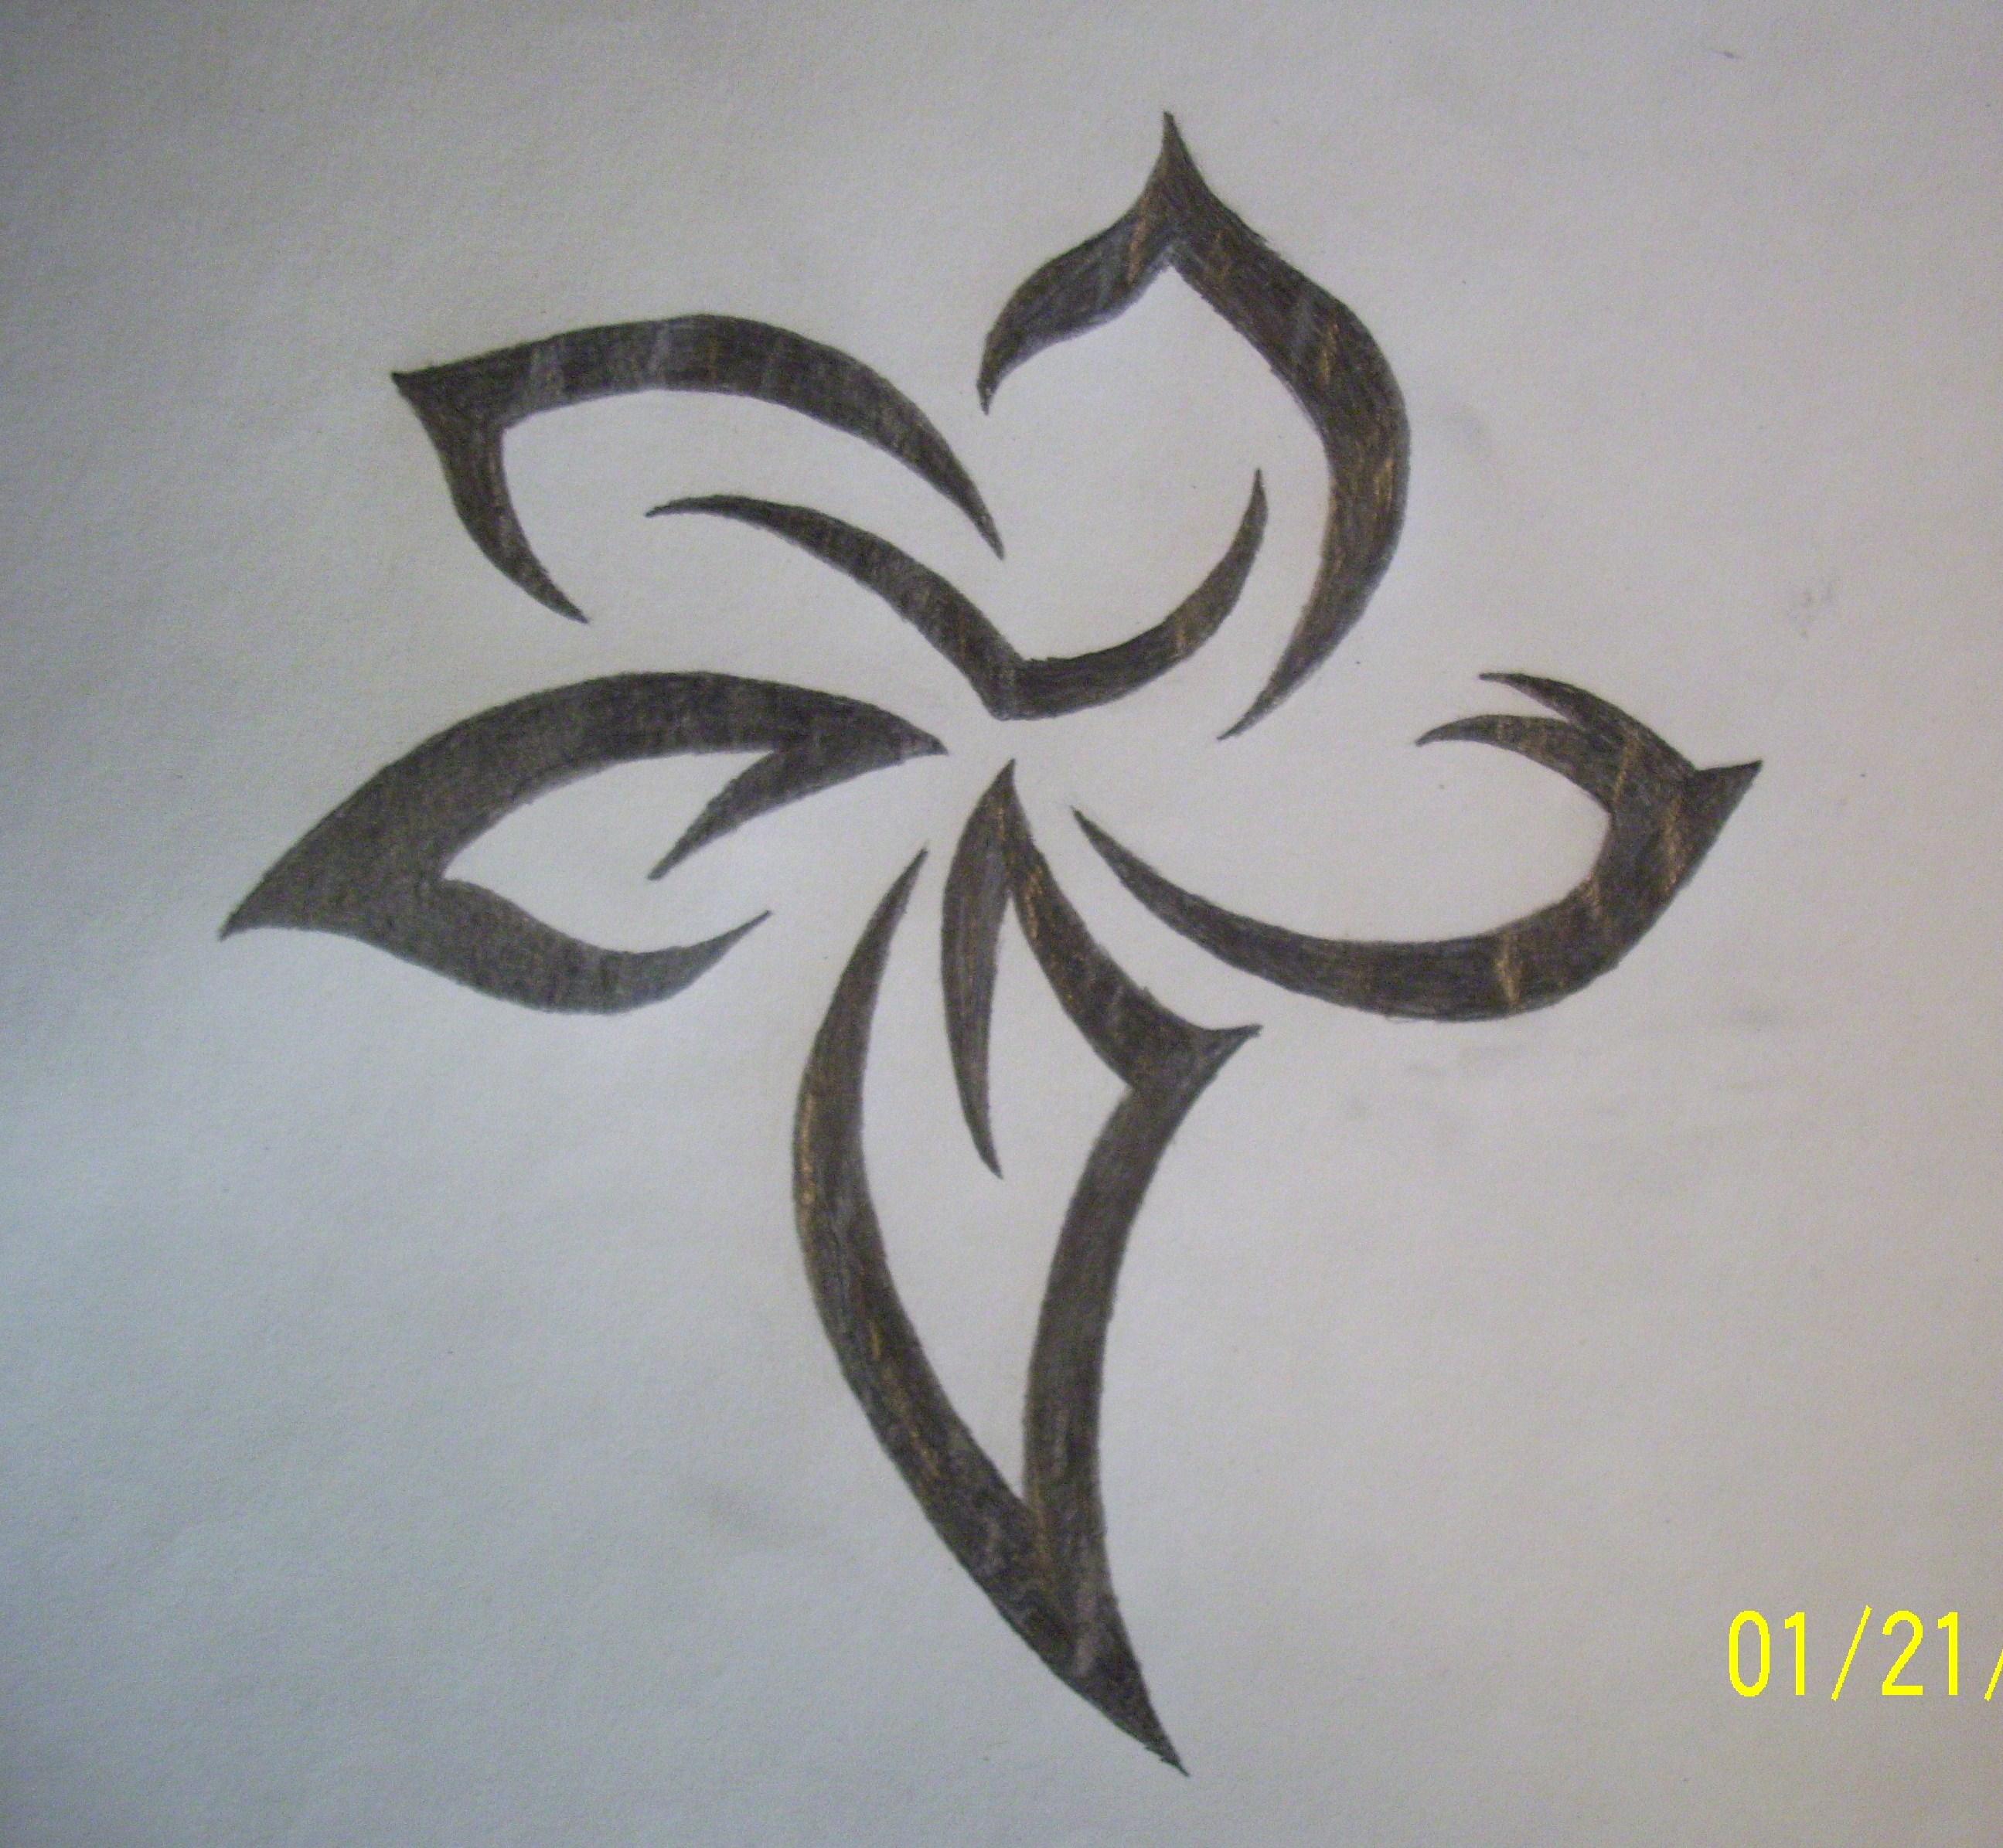 2591x2391 Flower E2 80 93 Page 15 Pencil Art Drawing Photo ~ Loversiq